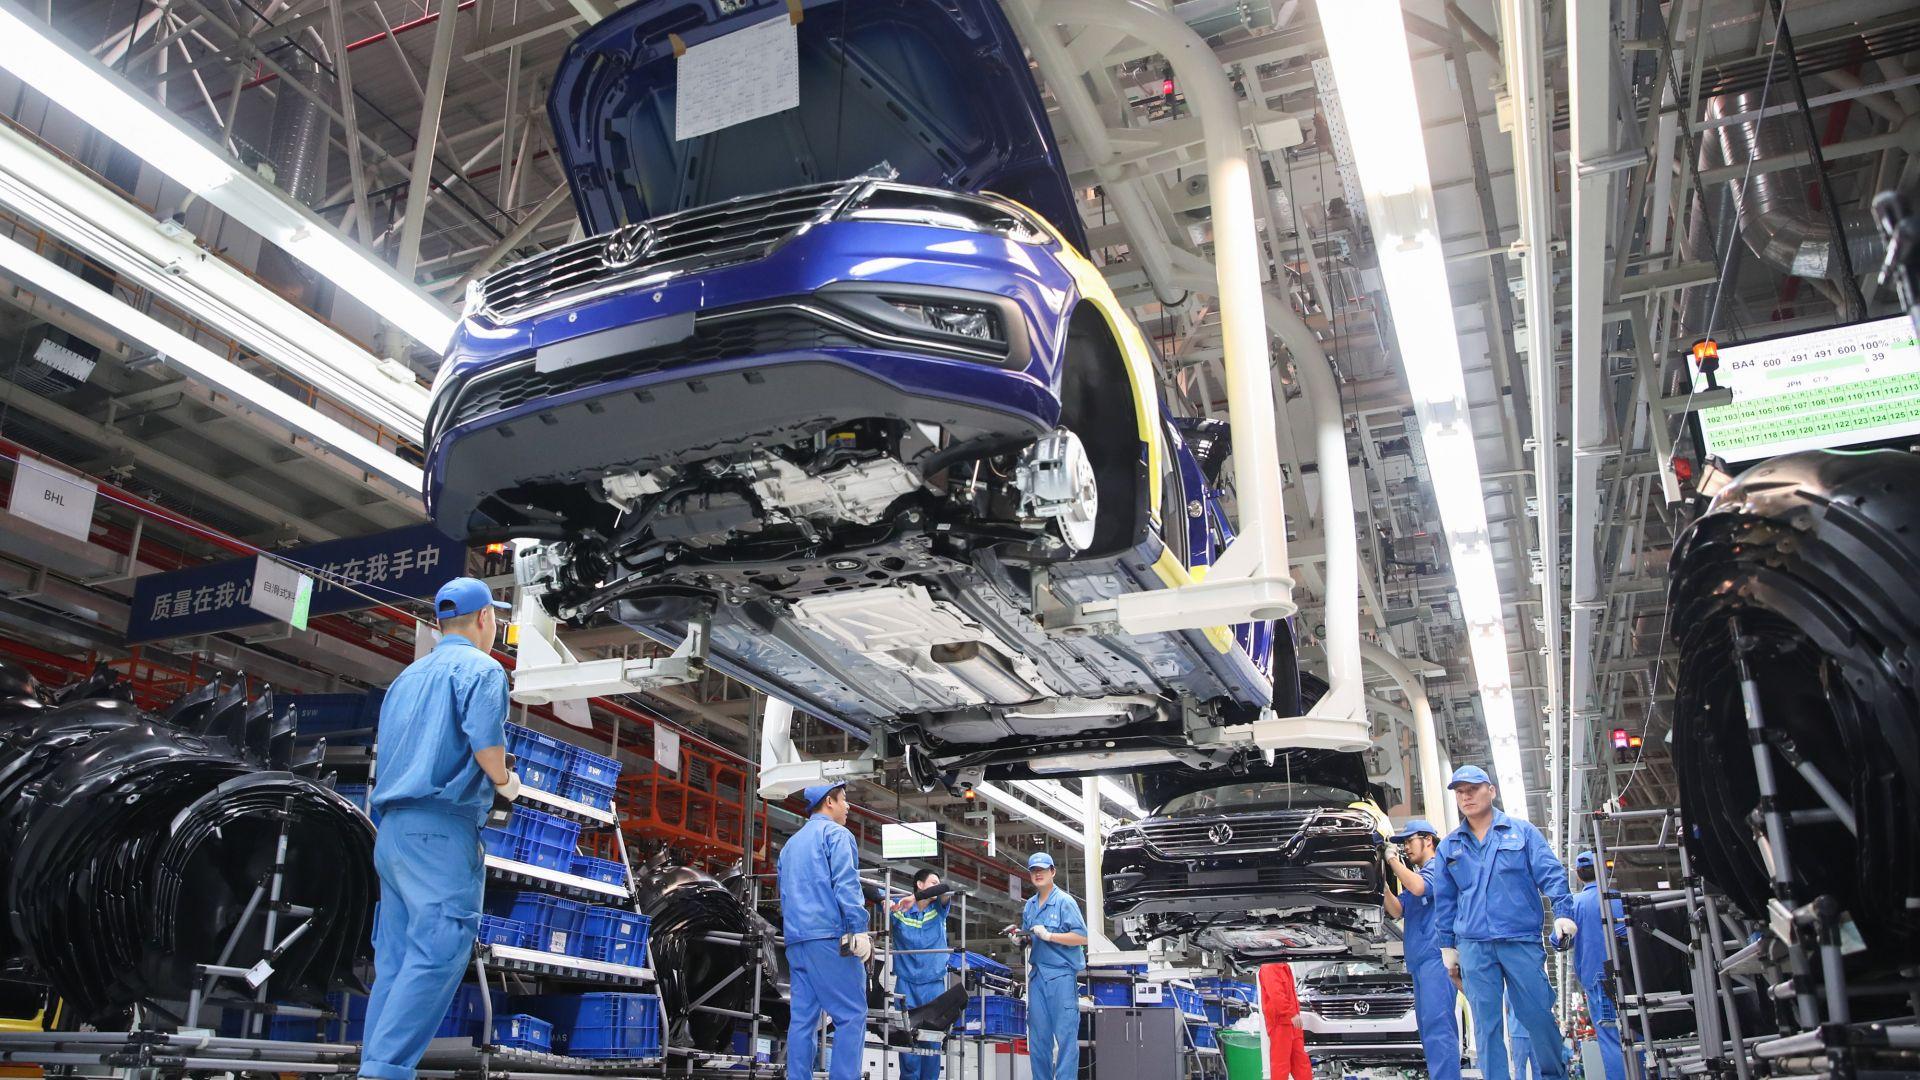 Фолксваген внася в Китай части за 9 млрд. долара